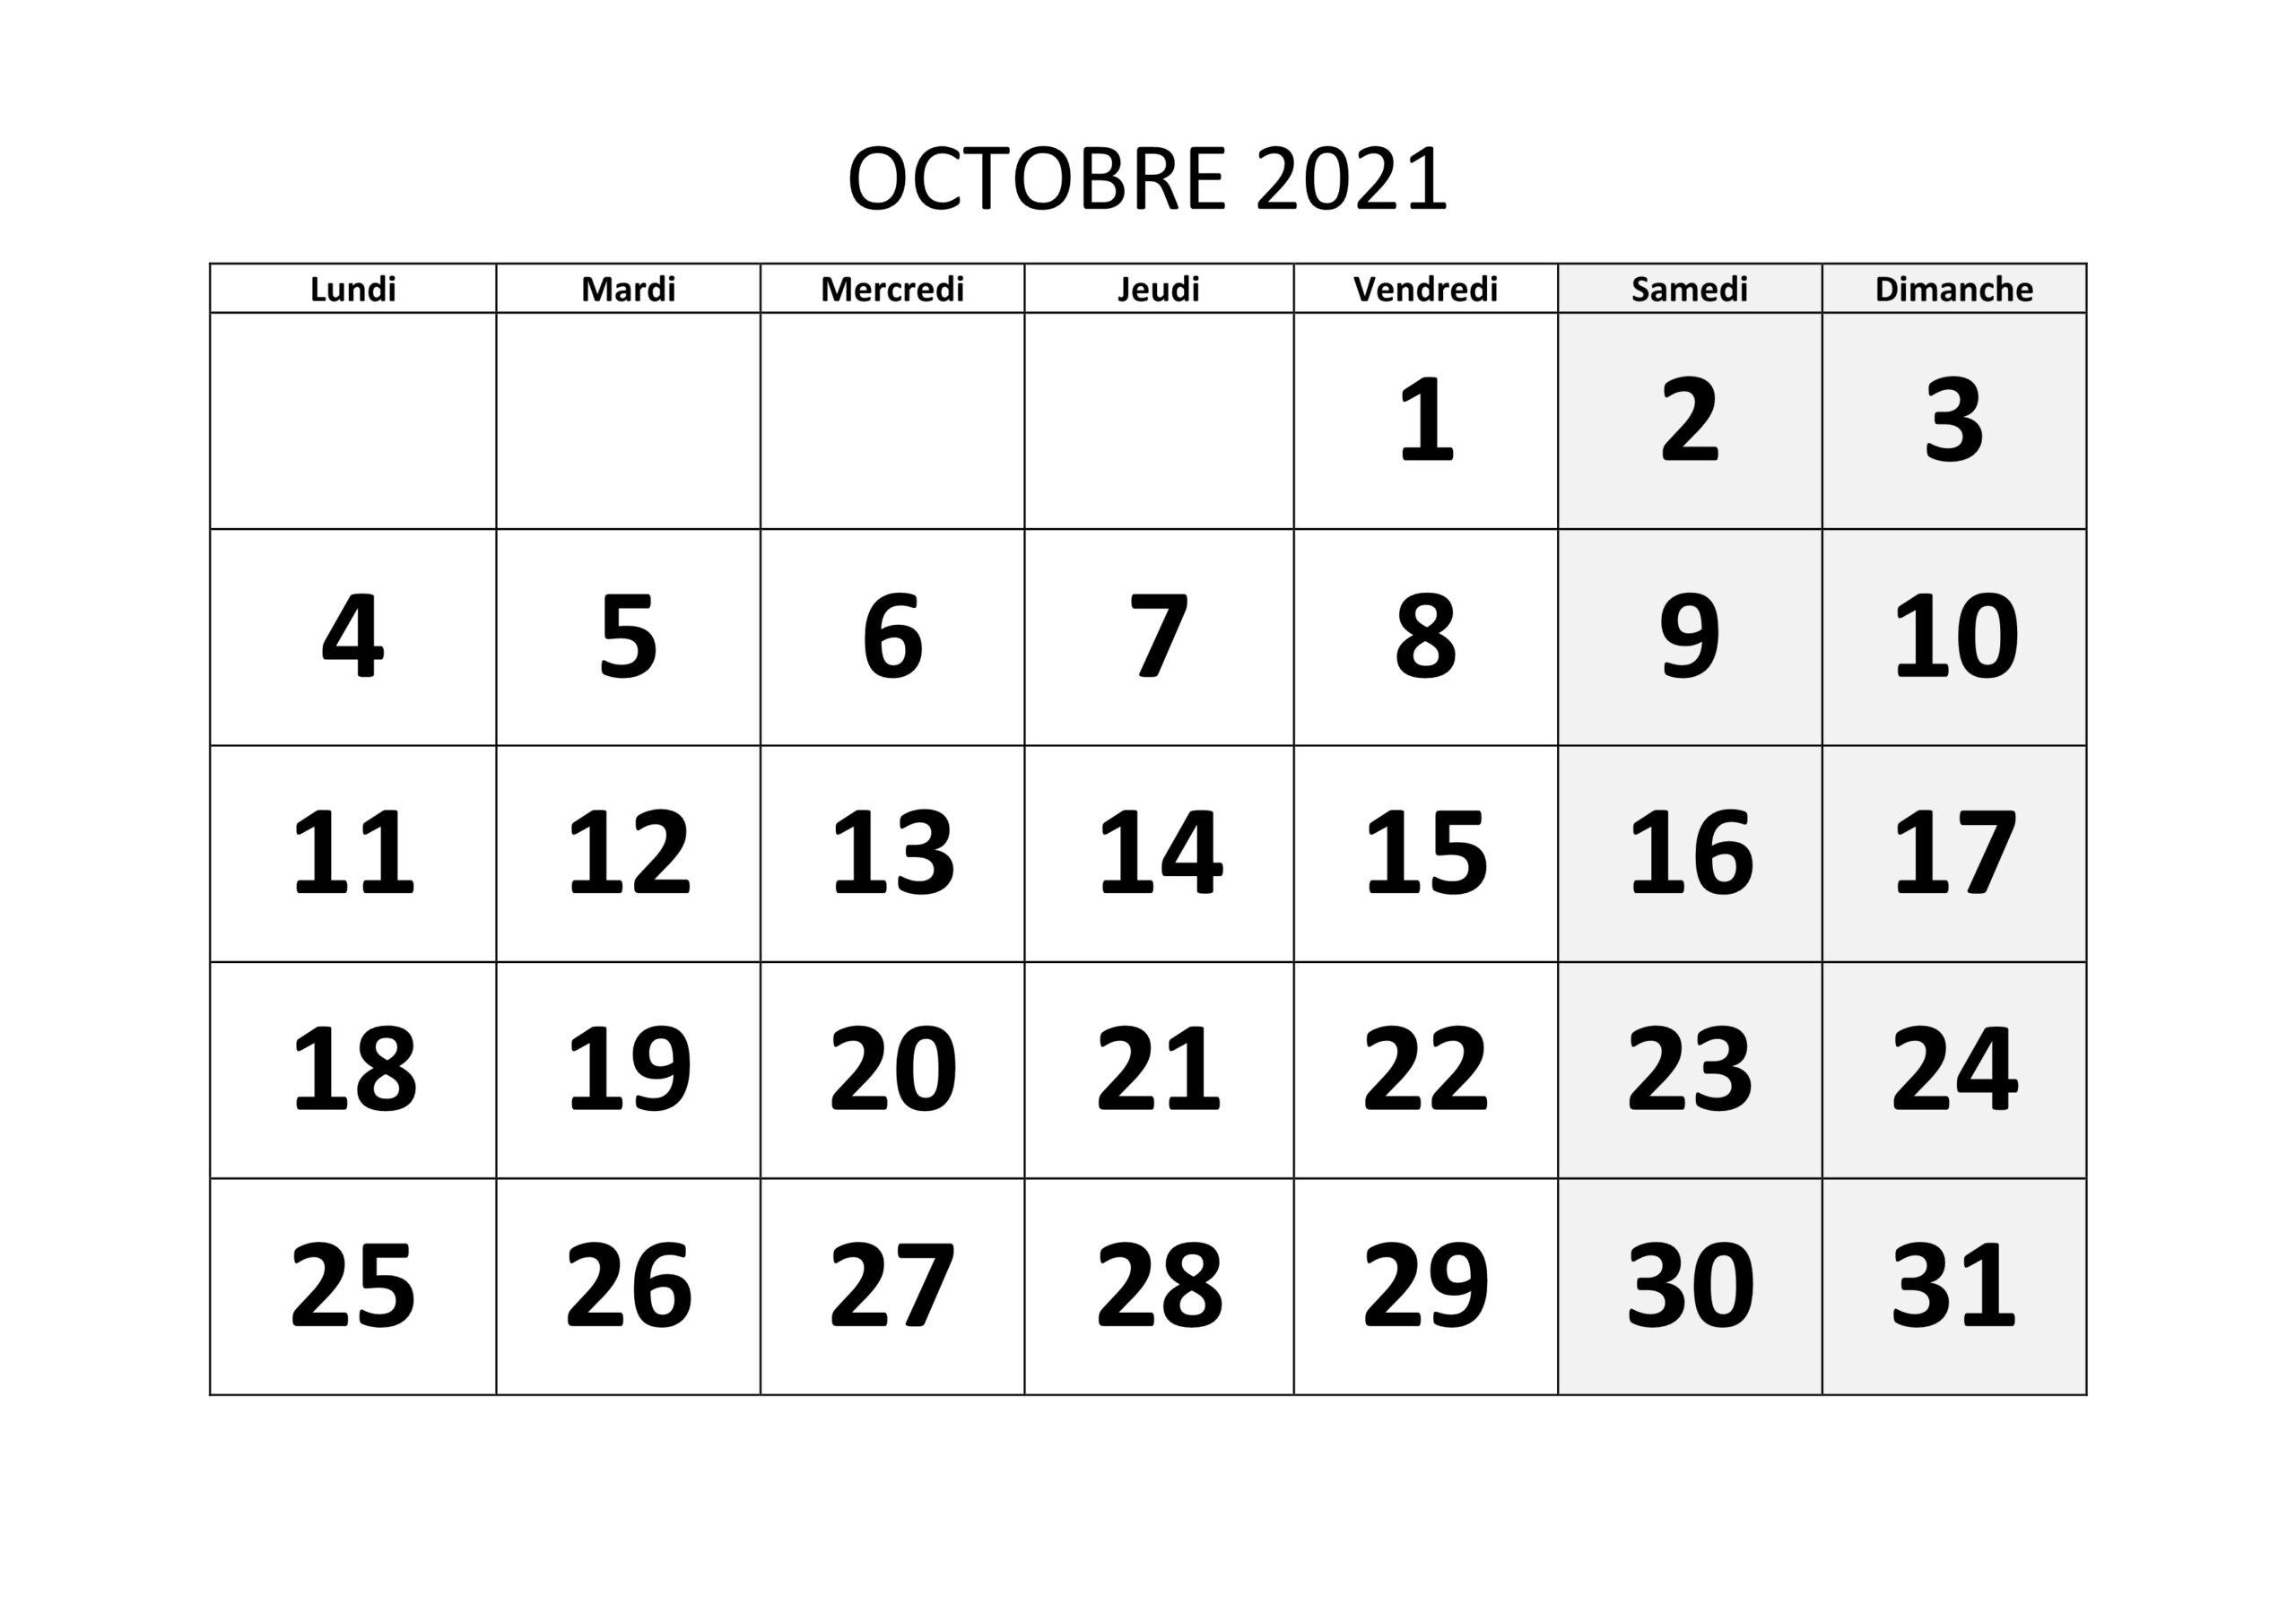 Calendrier Octobre 2021 Excel